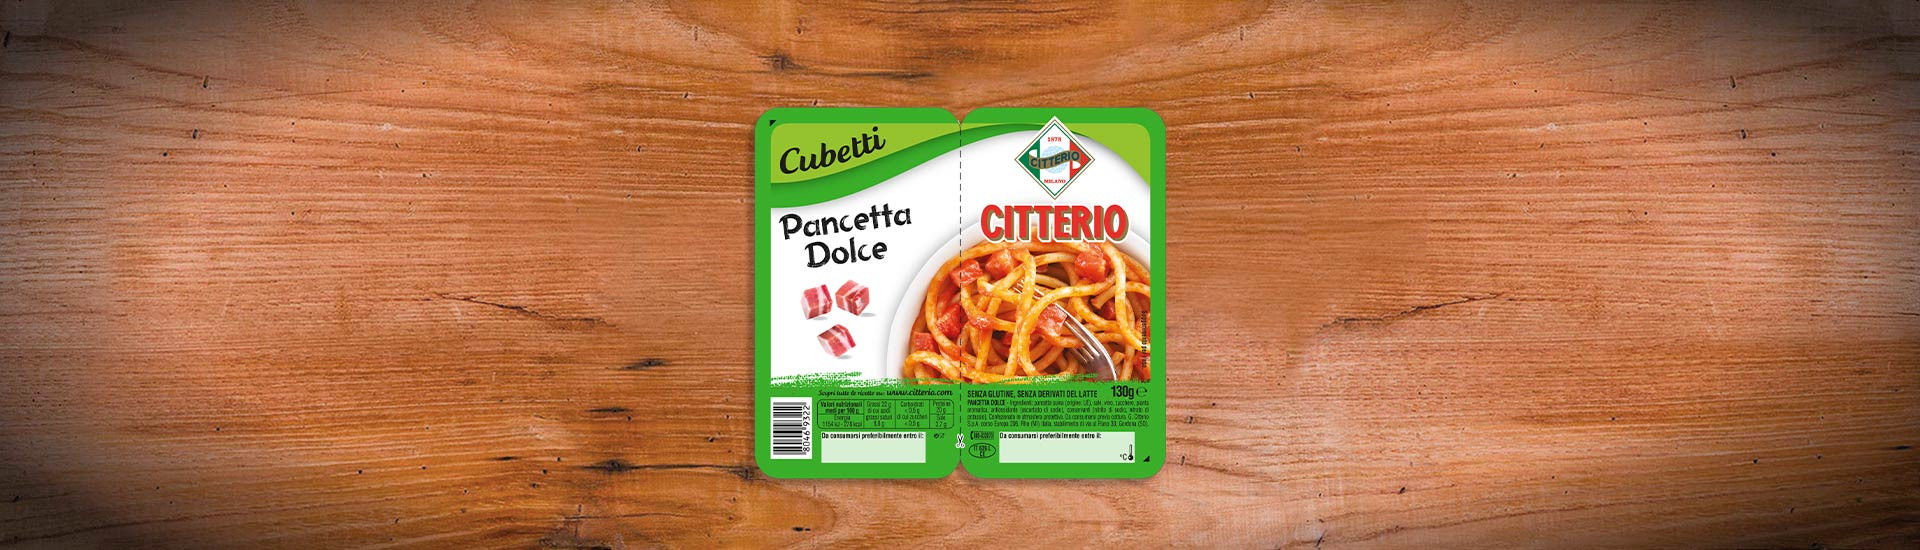 Pancetta Dolce Citterio Cubetti